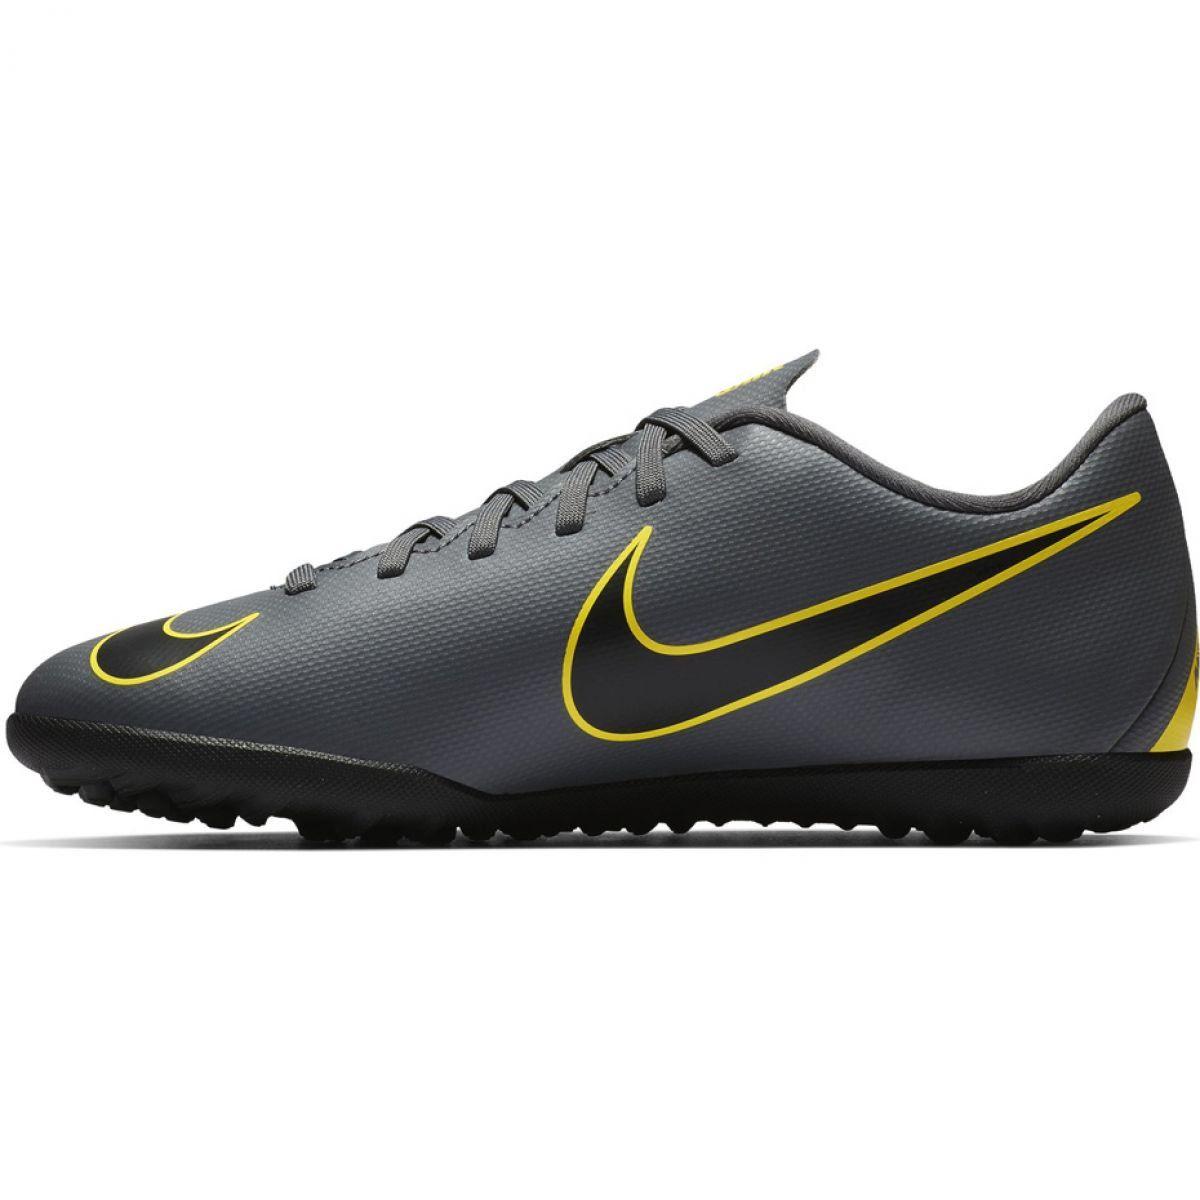 Buty Pilkarskie Nike Mercurial Vapor X 12 Club Tf Jr Ah7355 070 Szare Czarne Football Shoes Nike Shoes